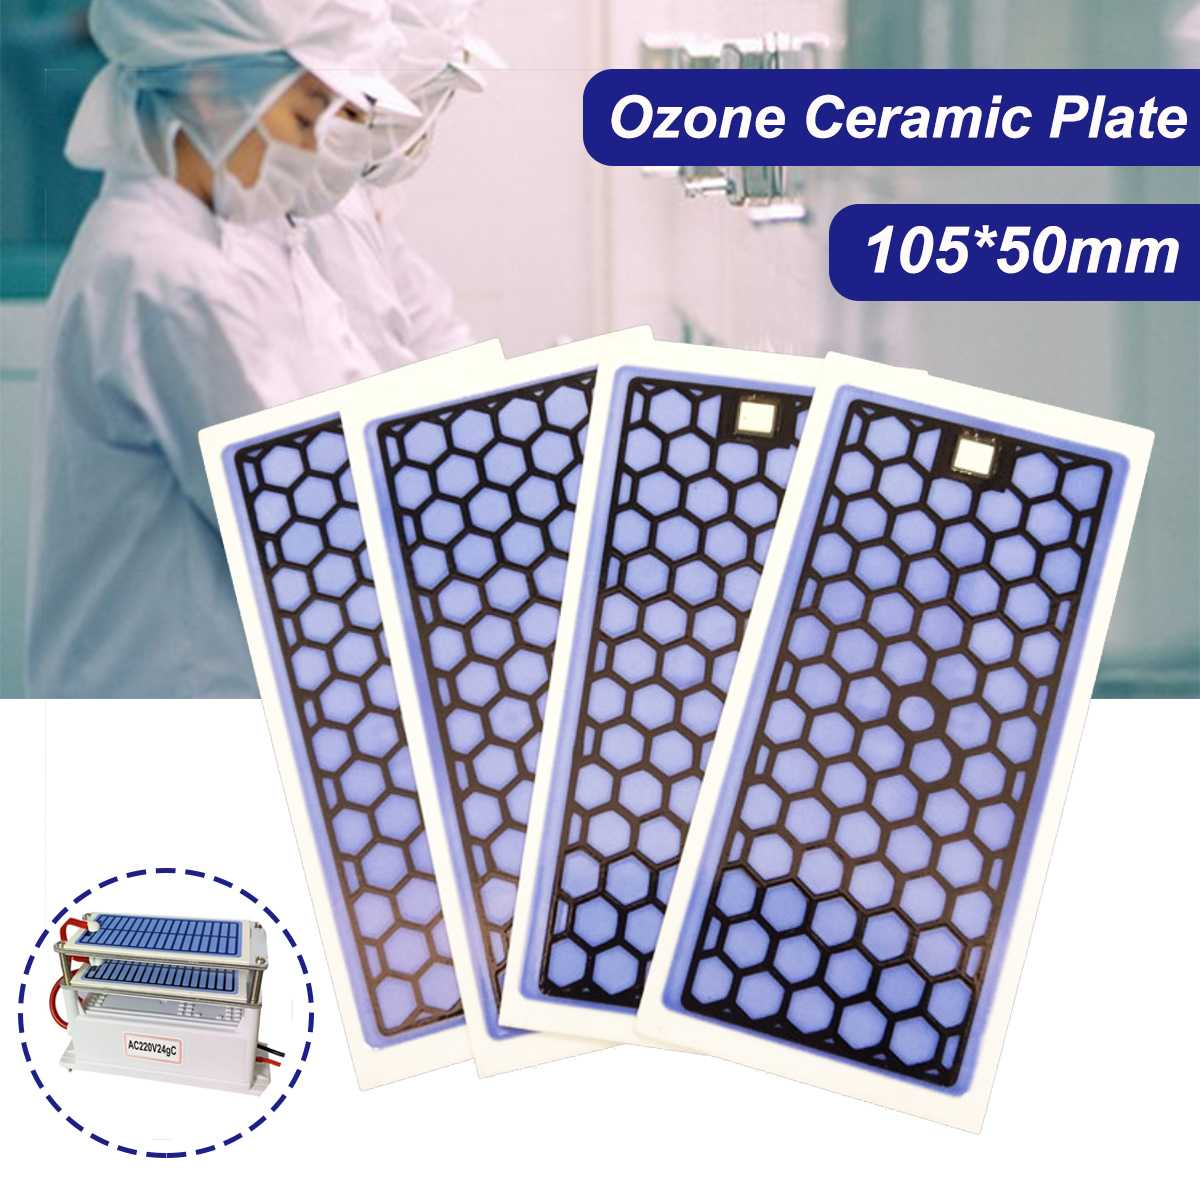 Ozone Generator  5g Ceramic Plate Home Air Purifier Ozonizador Ozonator Air Cleaner Ozon Generator Ozonizer Sterilization Odor